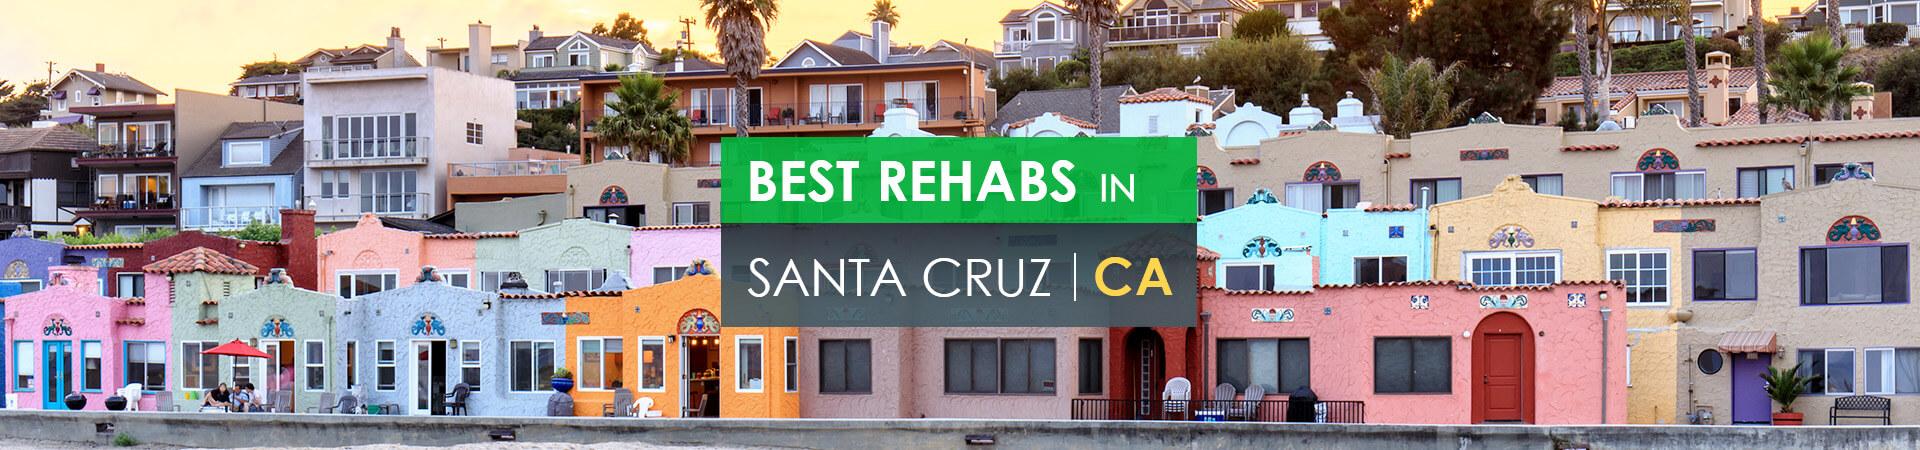 Best rehabs in Santa Cruz, CA